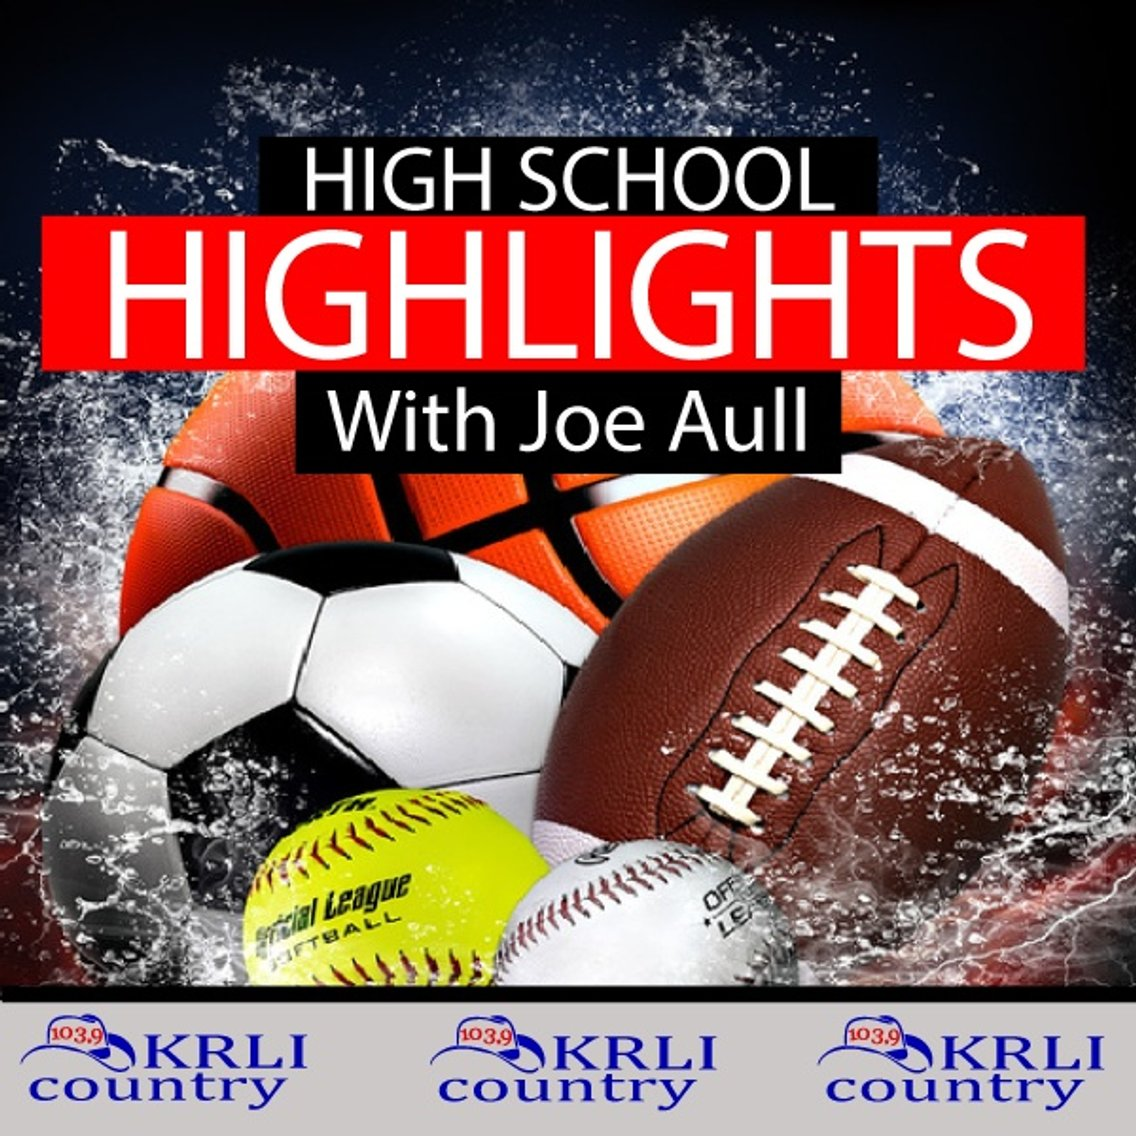 High School Highlights with Joe Aull - imagen de portada